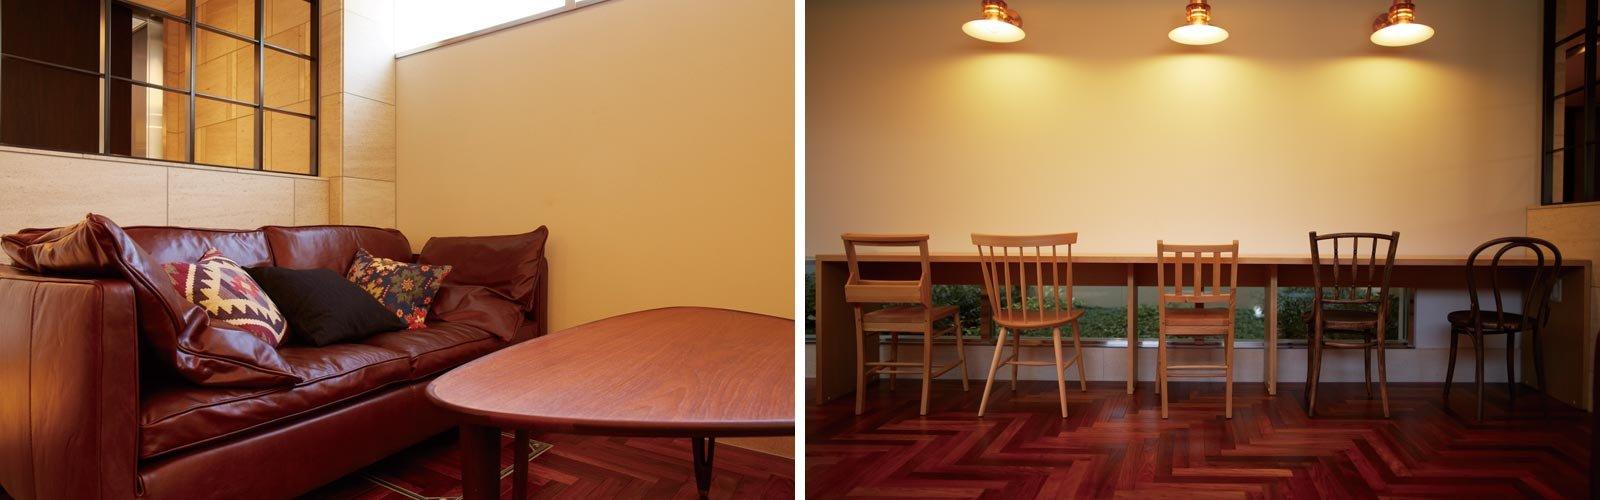 lounge03_oyama-theresidence.jpg